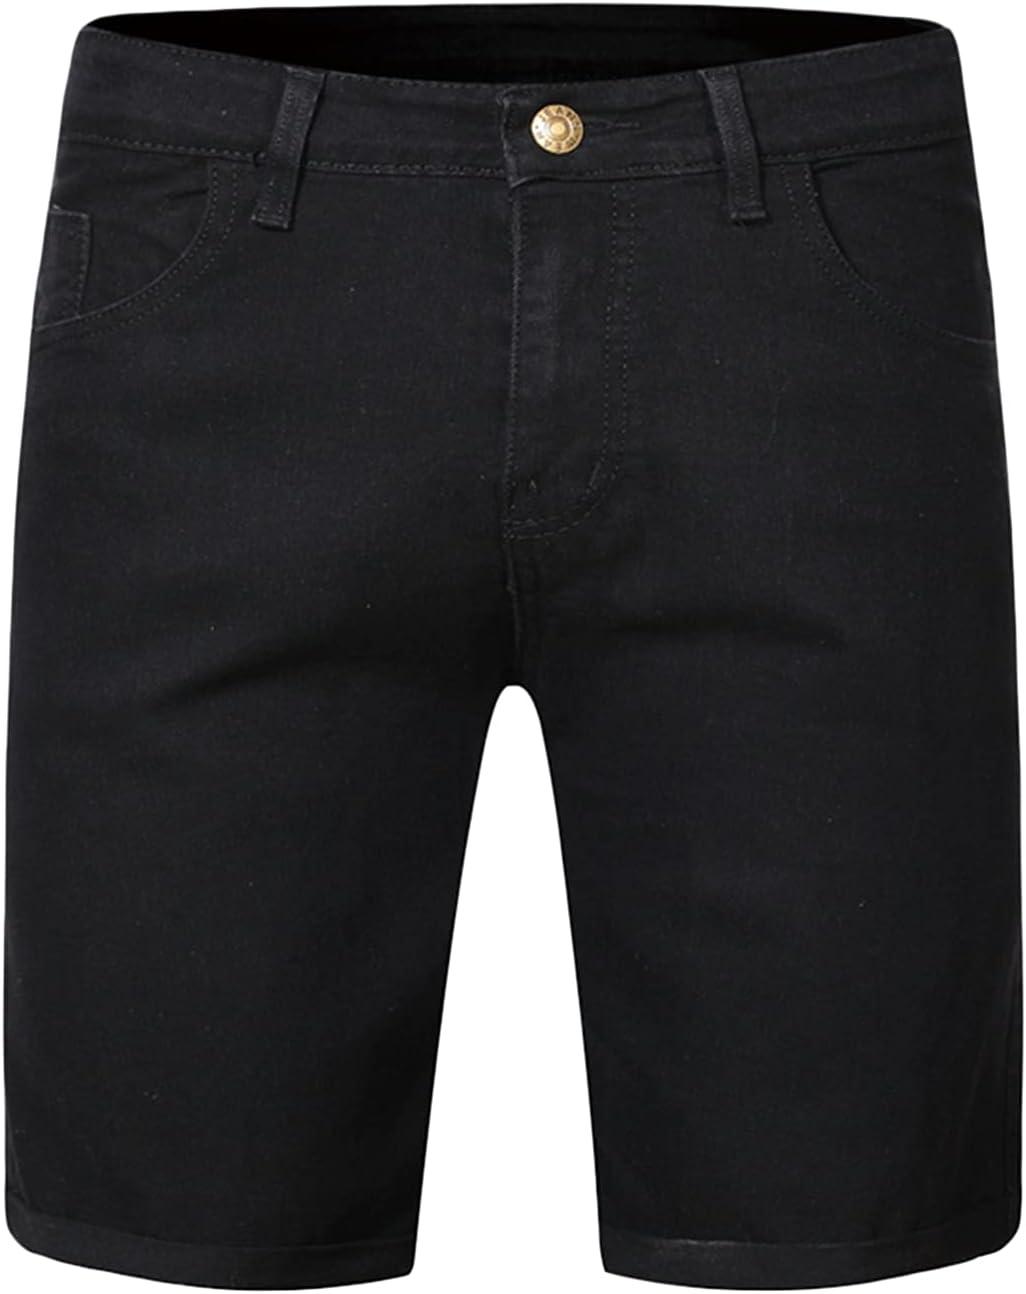 Men's Slim Fit Jean Shorts Comfy Stretch Knee Legth Denim Shorts Summer Distressed Casual Jeans Short Pants (Black,Medium)